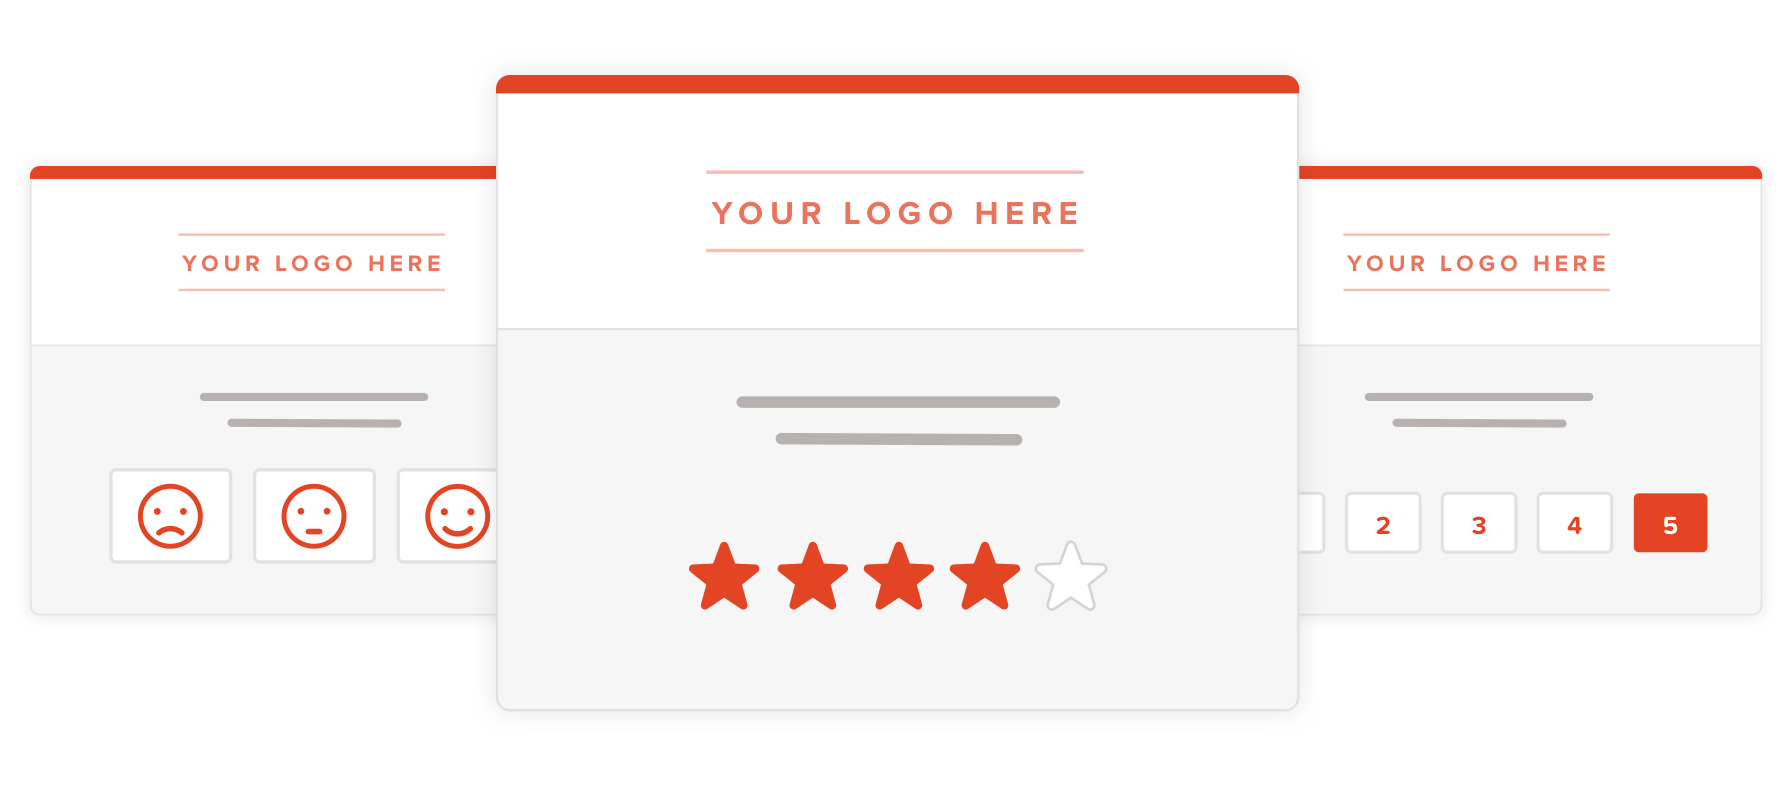 free customer survey hero image